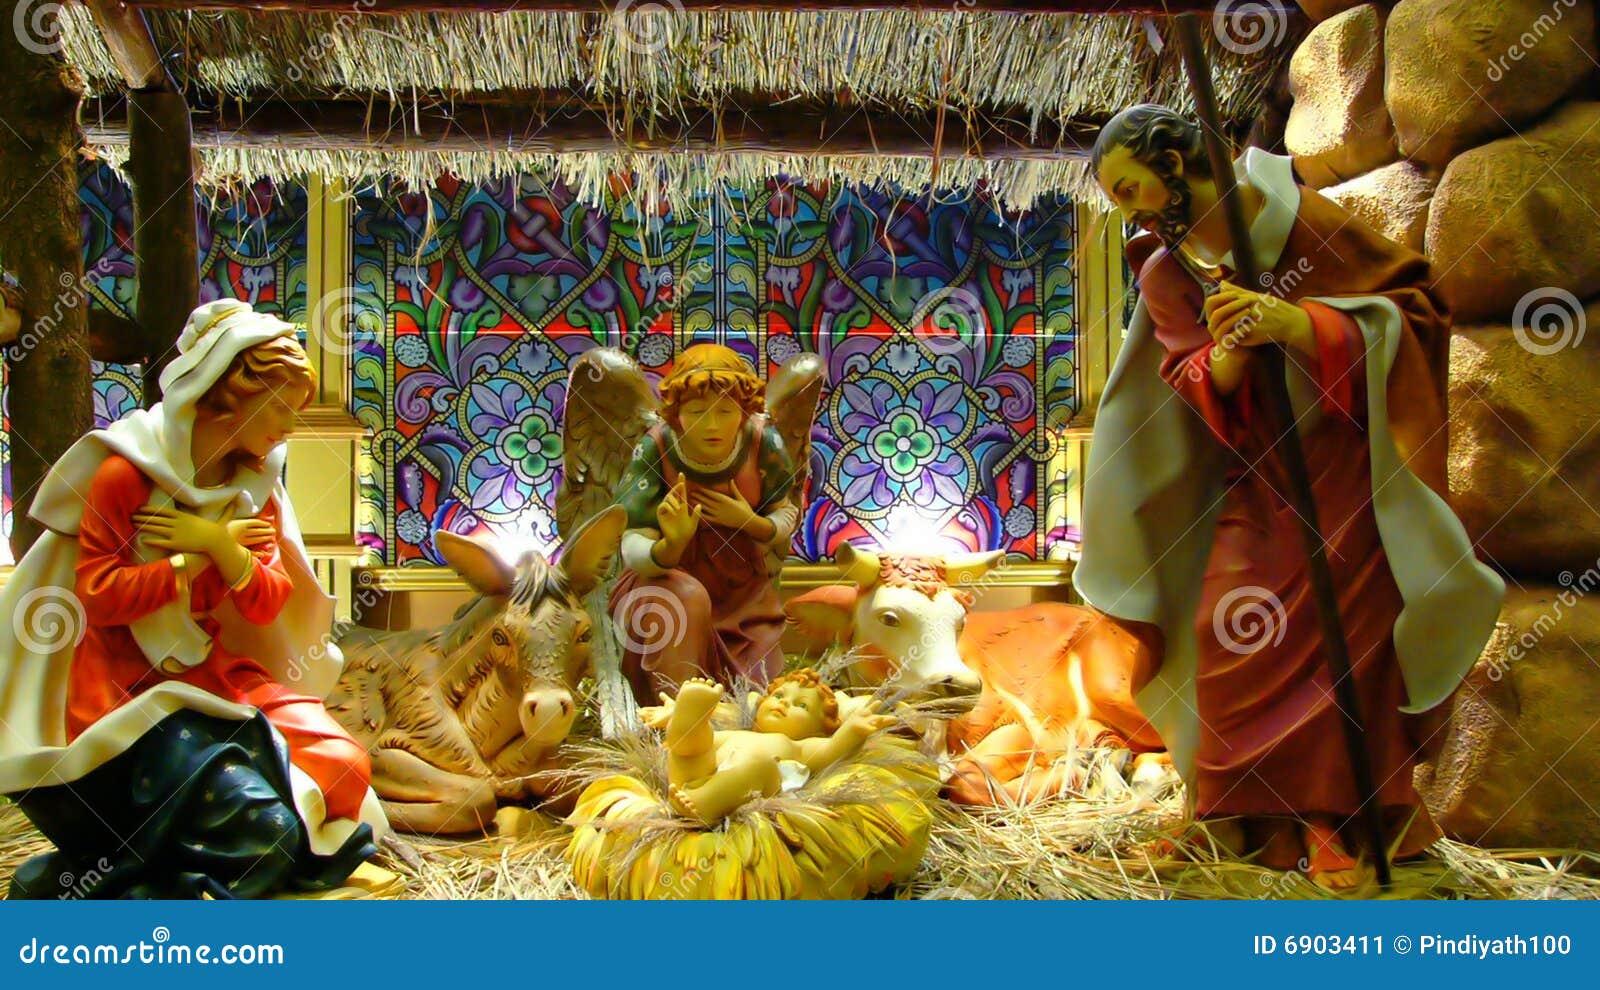 Birth Of Jesus Christ Christmas Stock Image - Image of straws ...